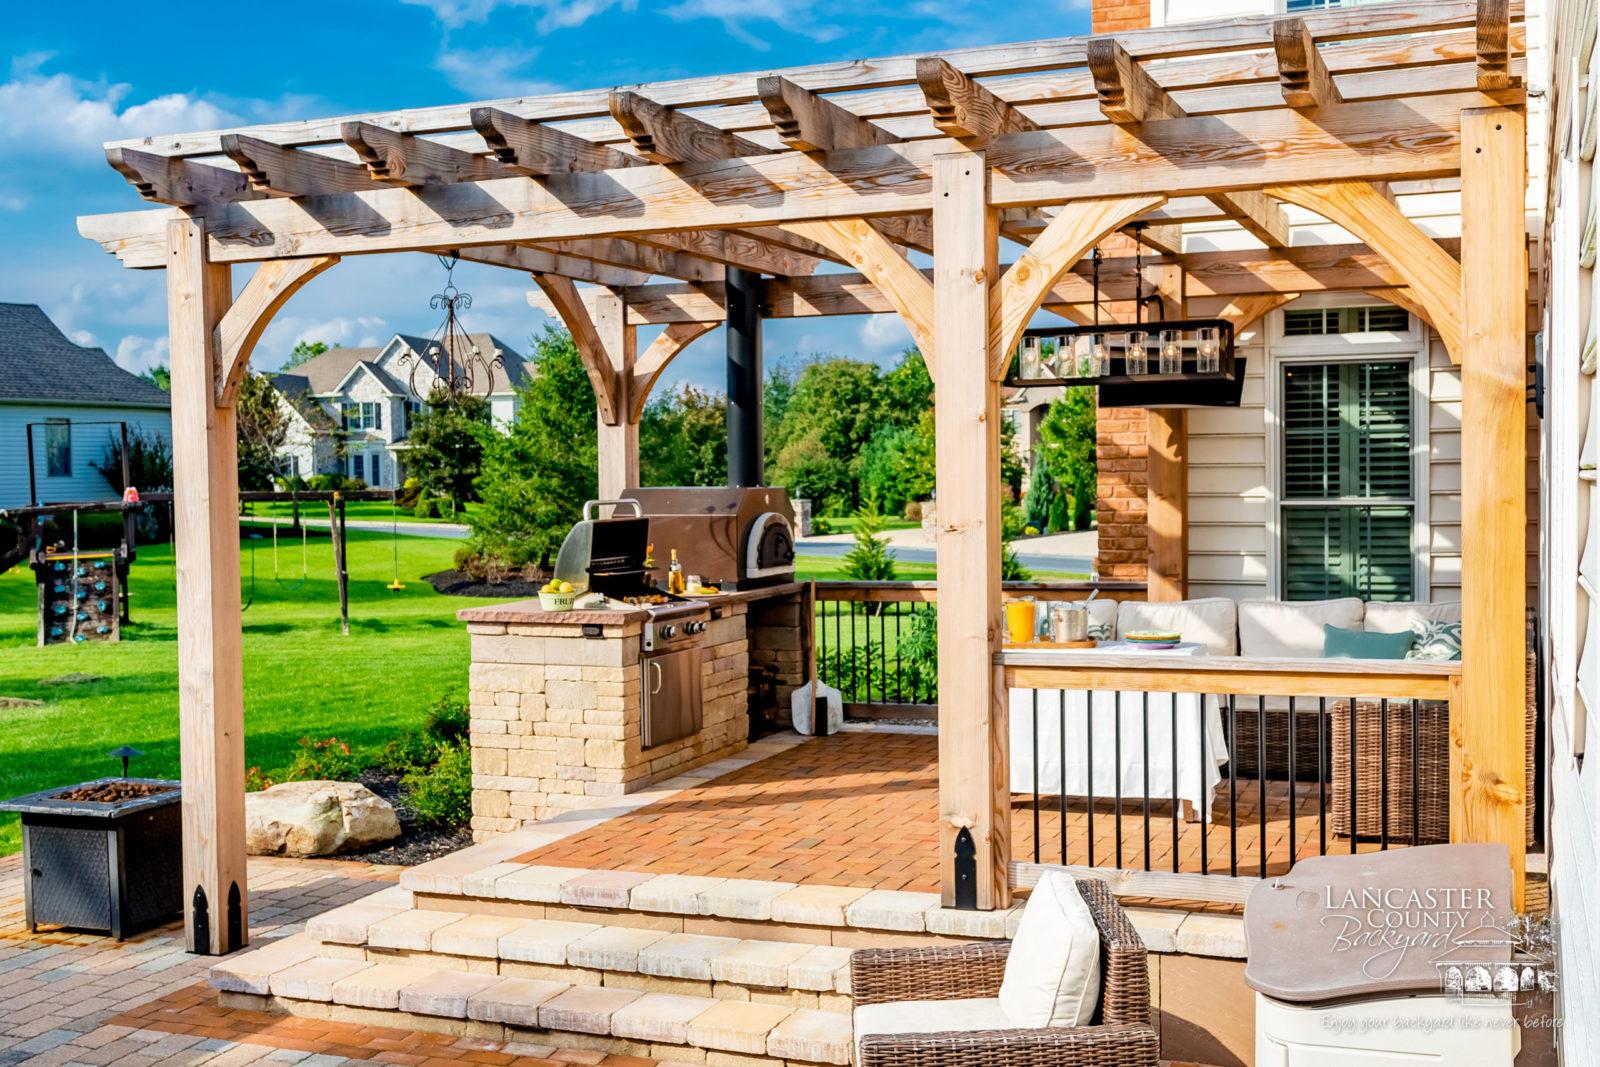 beautiful outdoor kitchen under a pergola